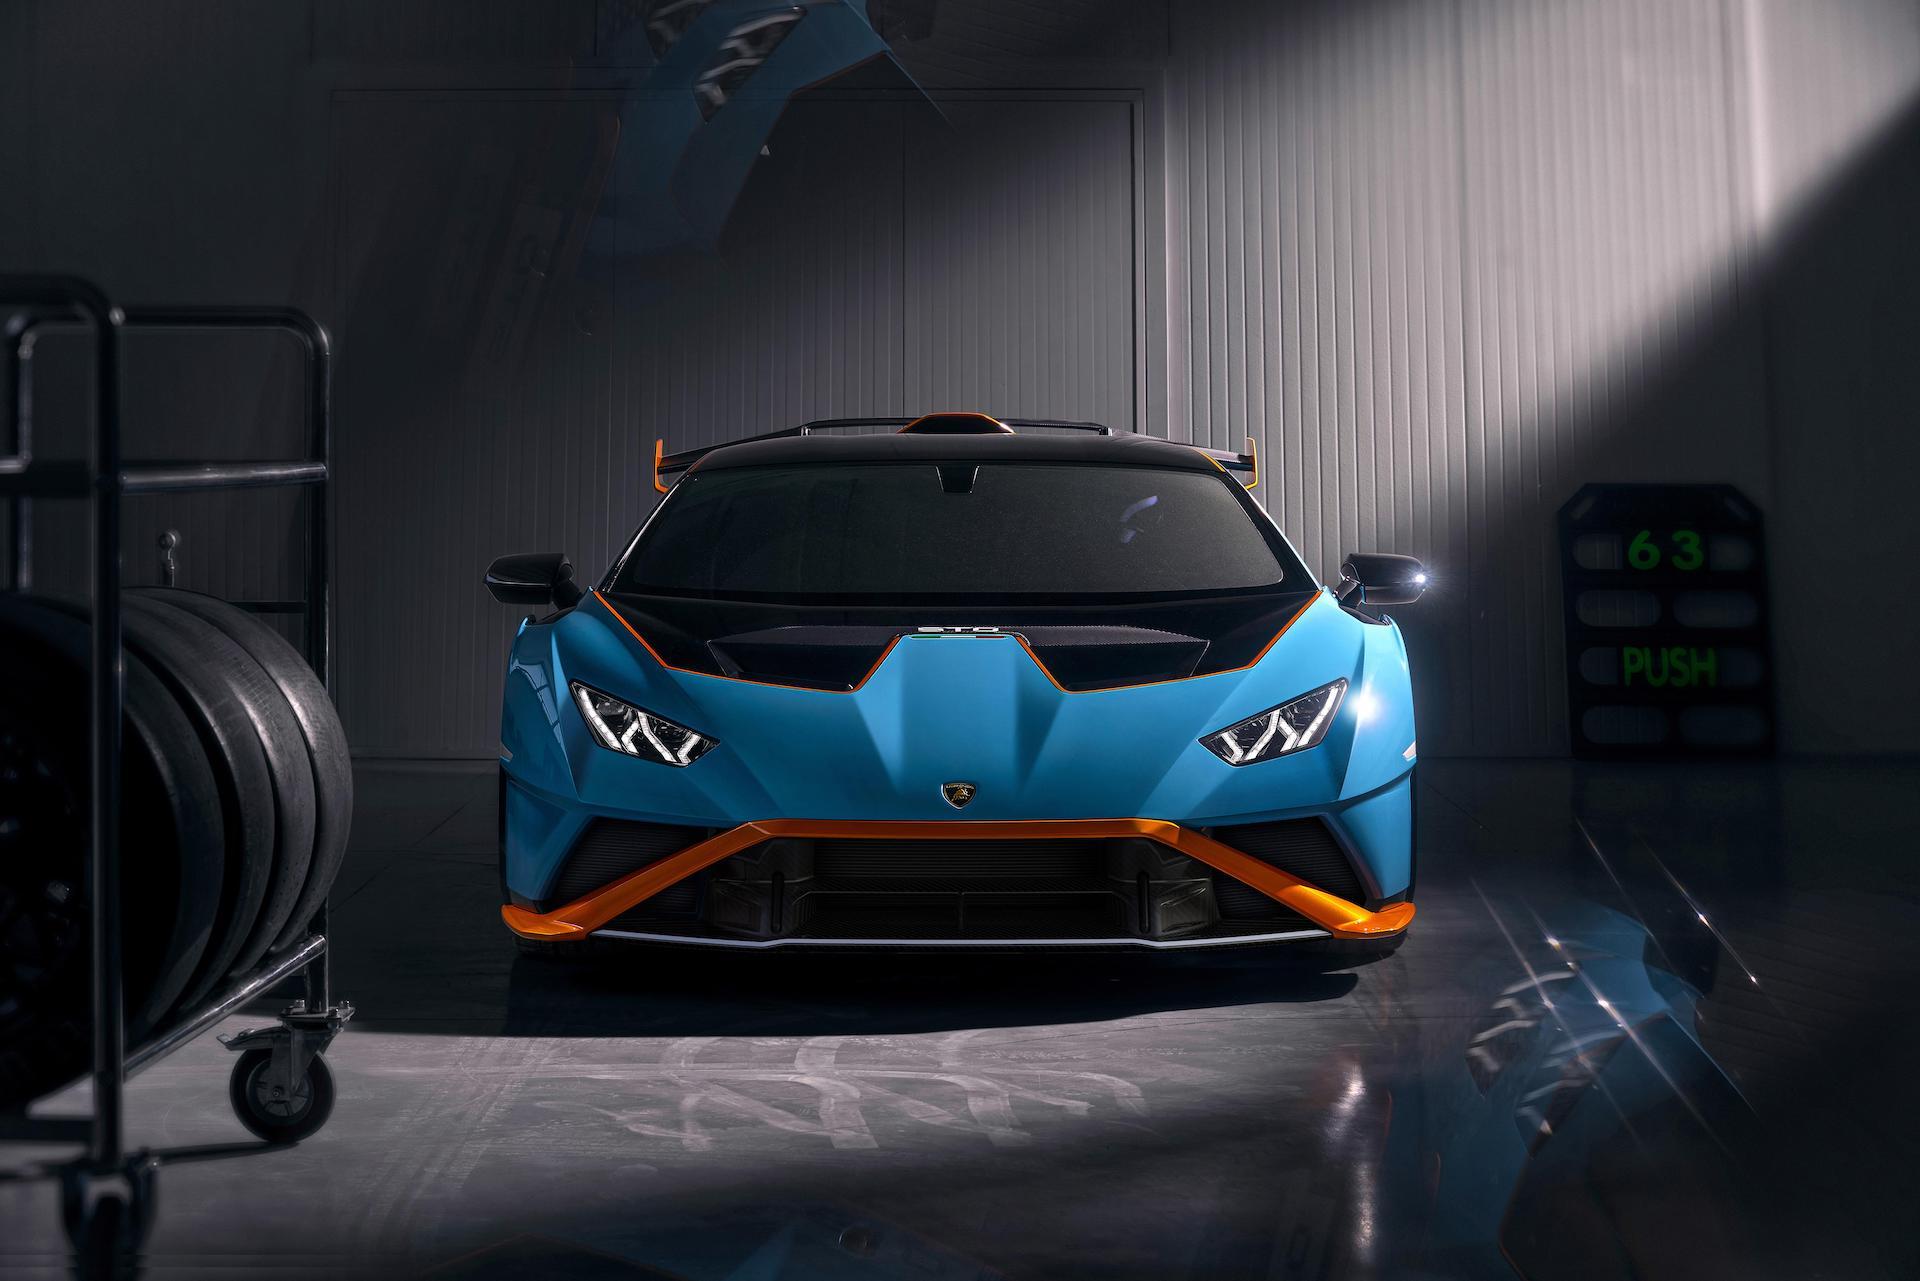 Der neue Lamborghini STO: Die Inkarnation des Squadra Corse-Erbes 1